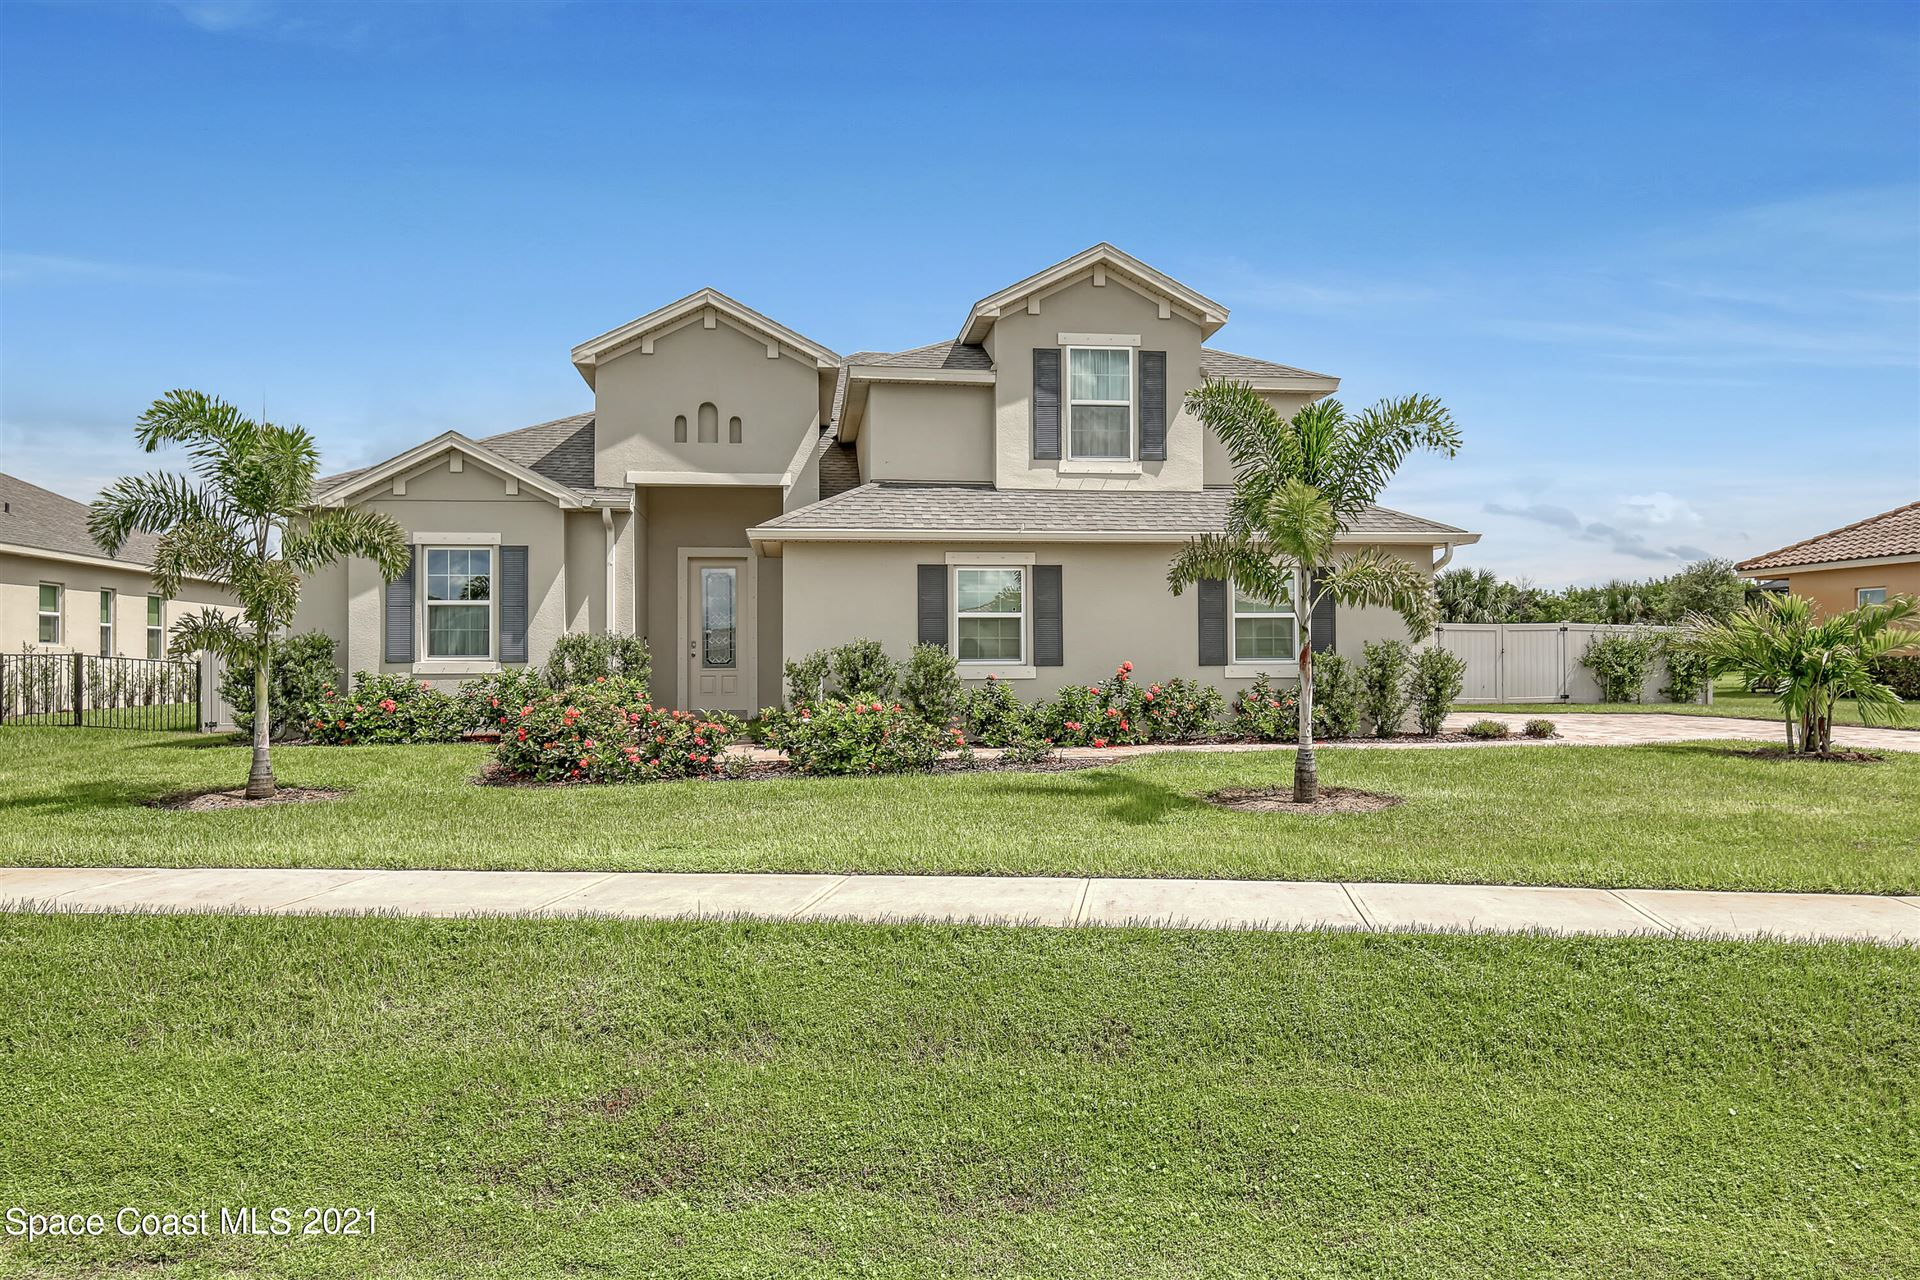 7277 Preserve Pointe Drive, Merritt Island, FL 32953 - #: 916383